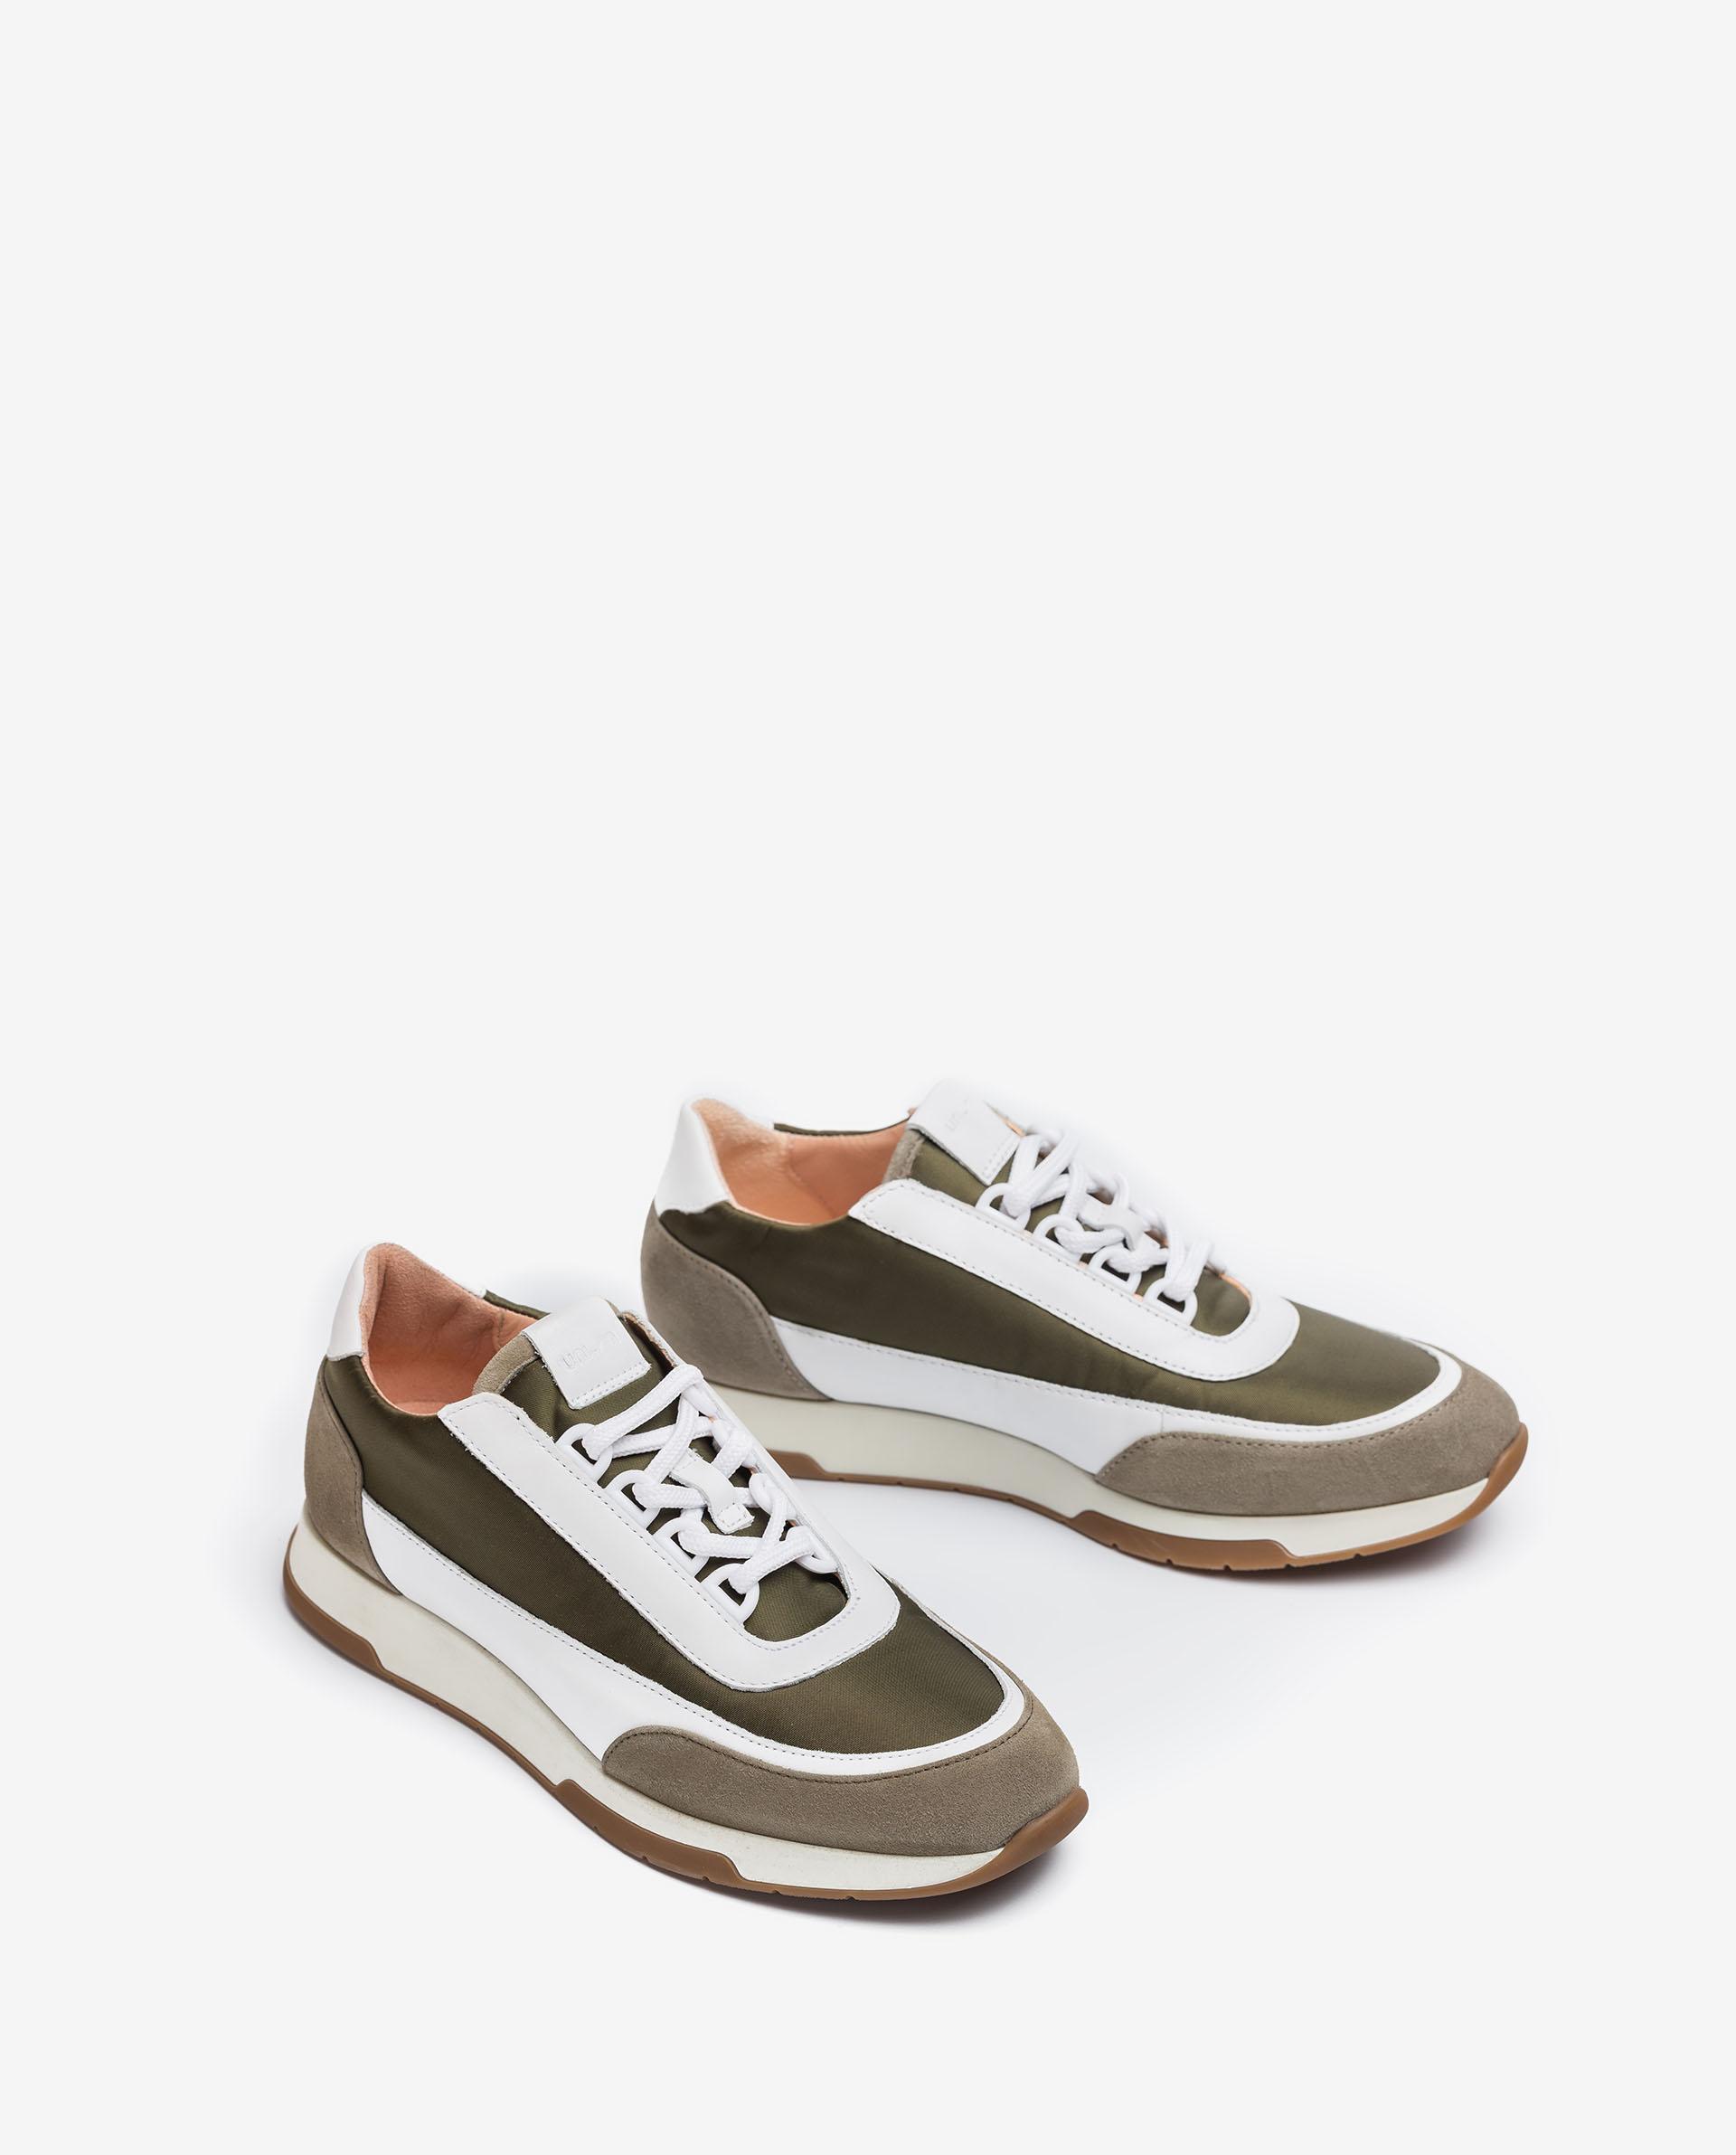 UNISA Multi materials sneakers FATI_21_MULTI 2